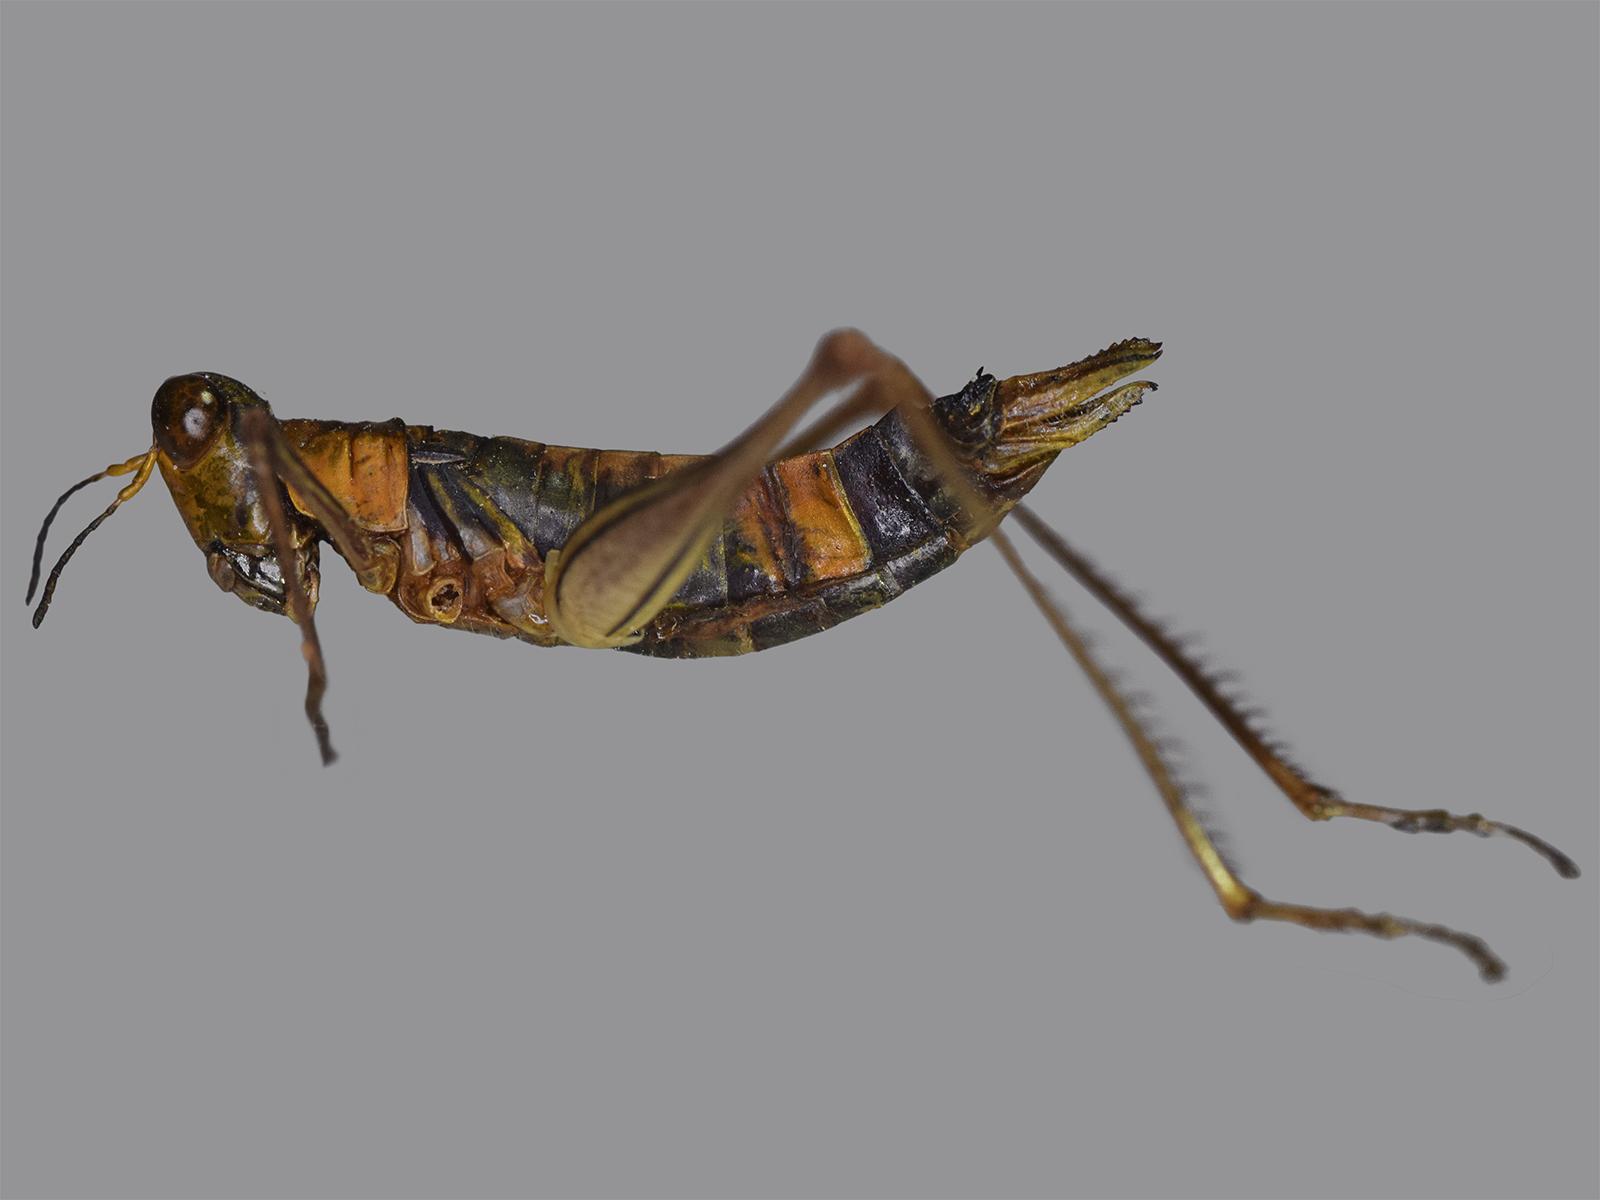 Paramastax rosenbergi (Burr, 1899)